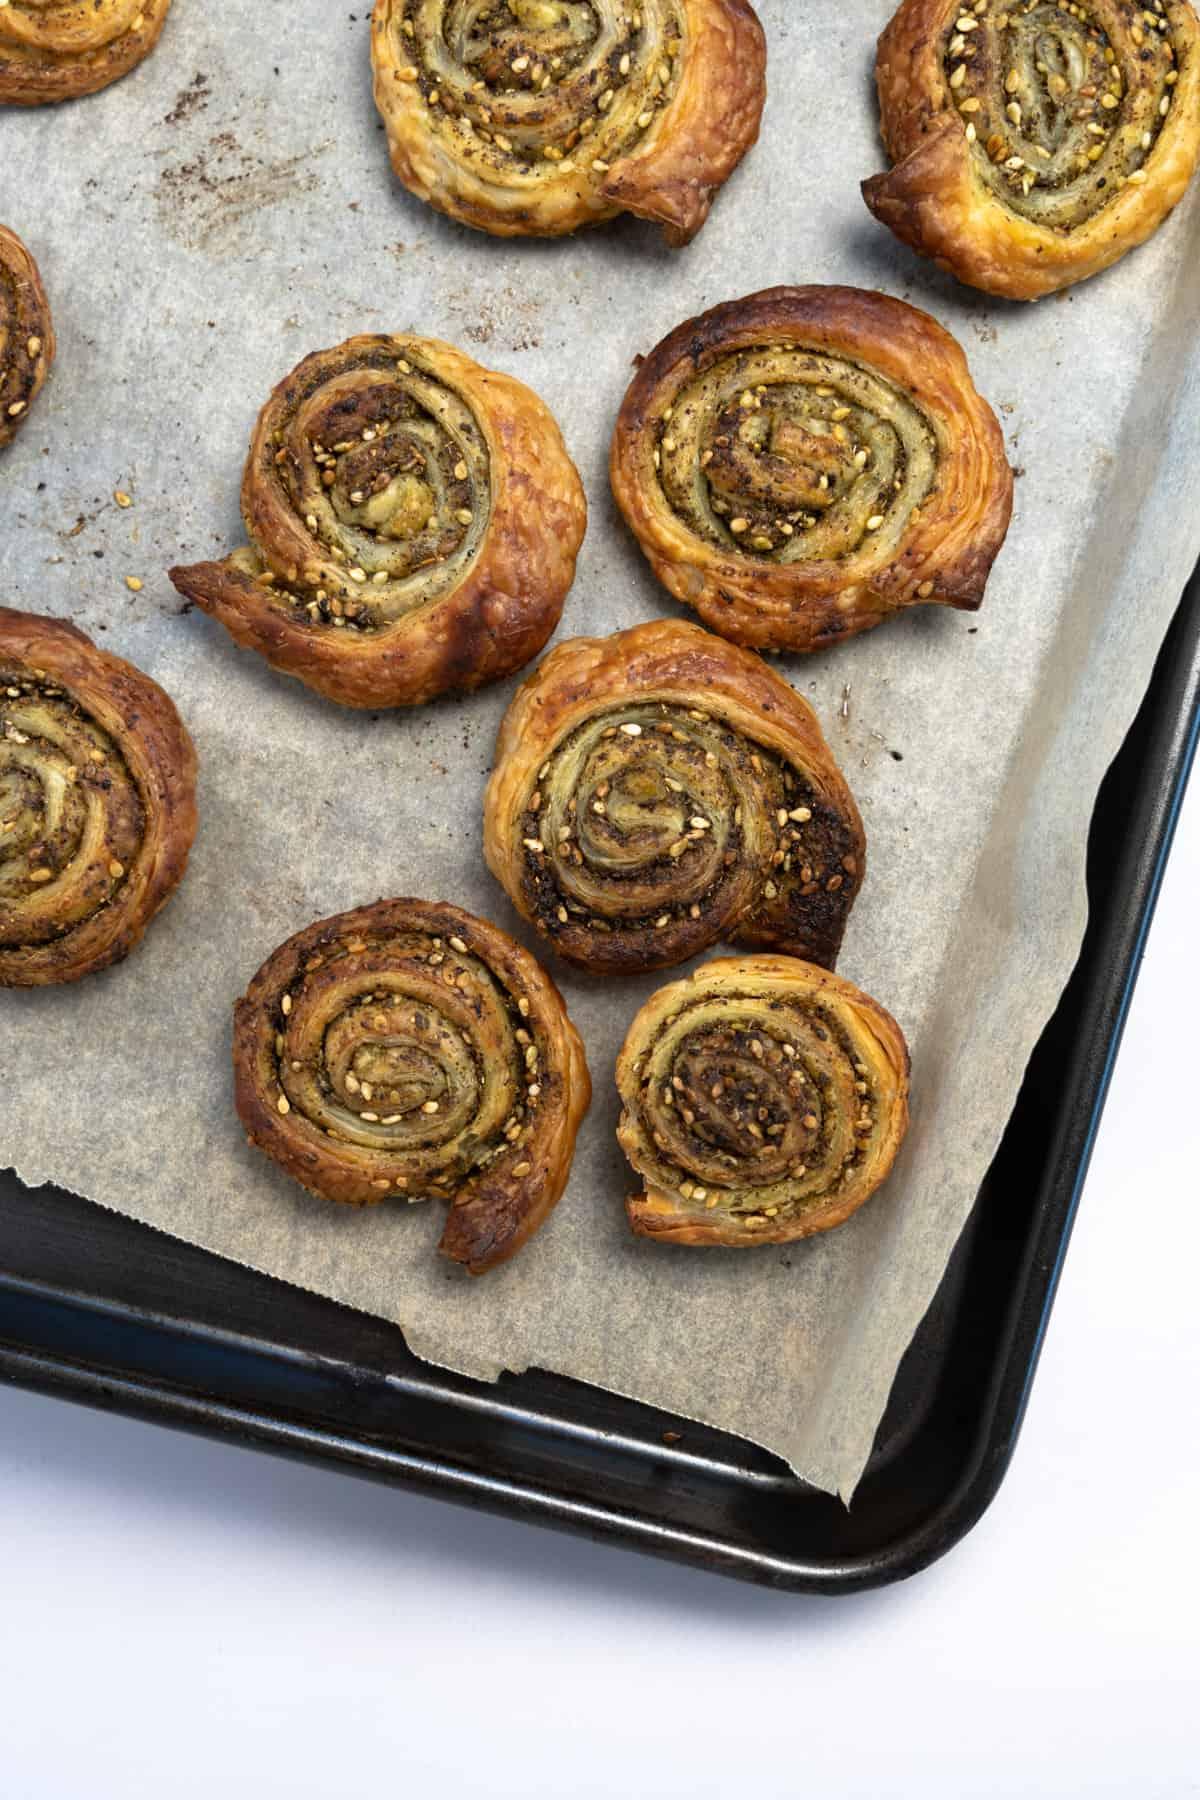 zaatar pinwheels on a baking sheet